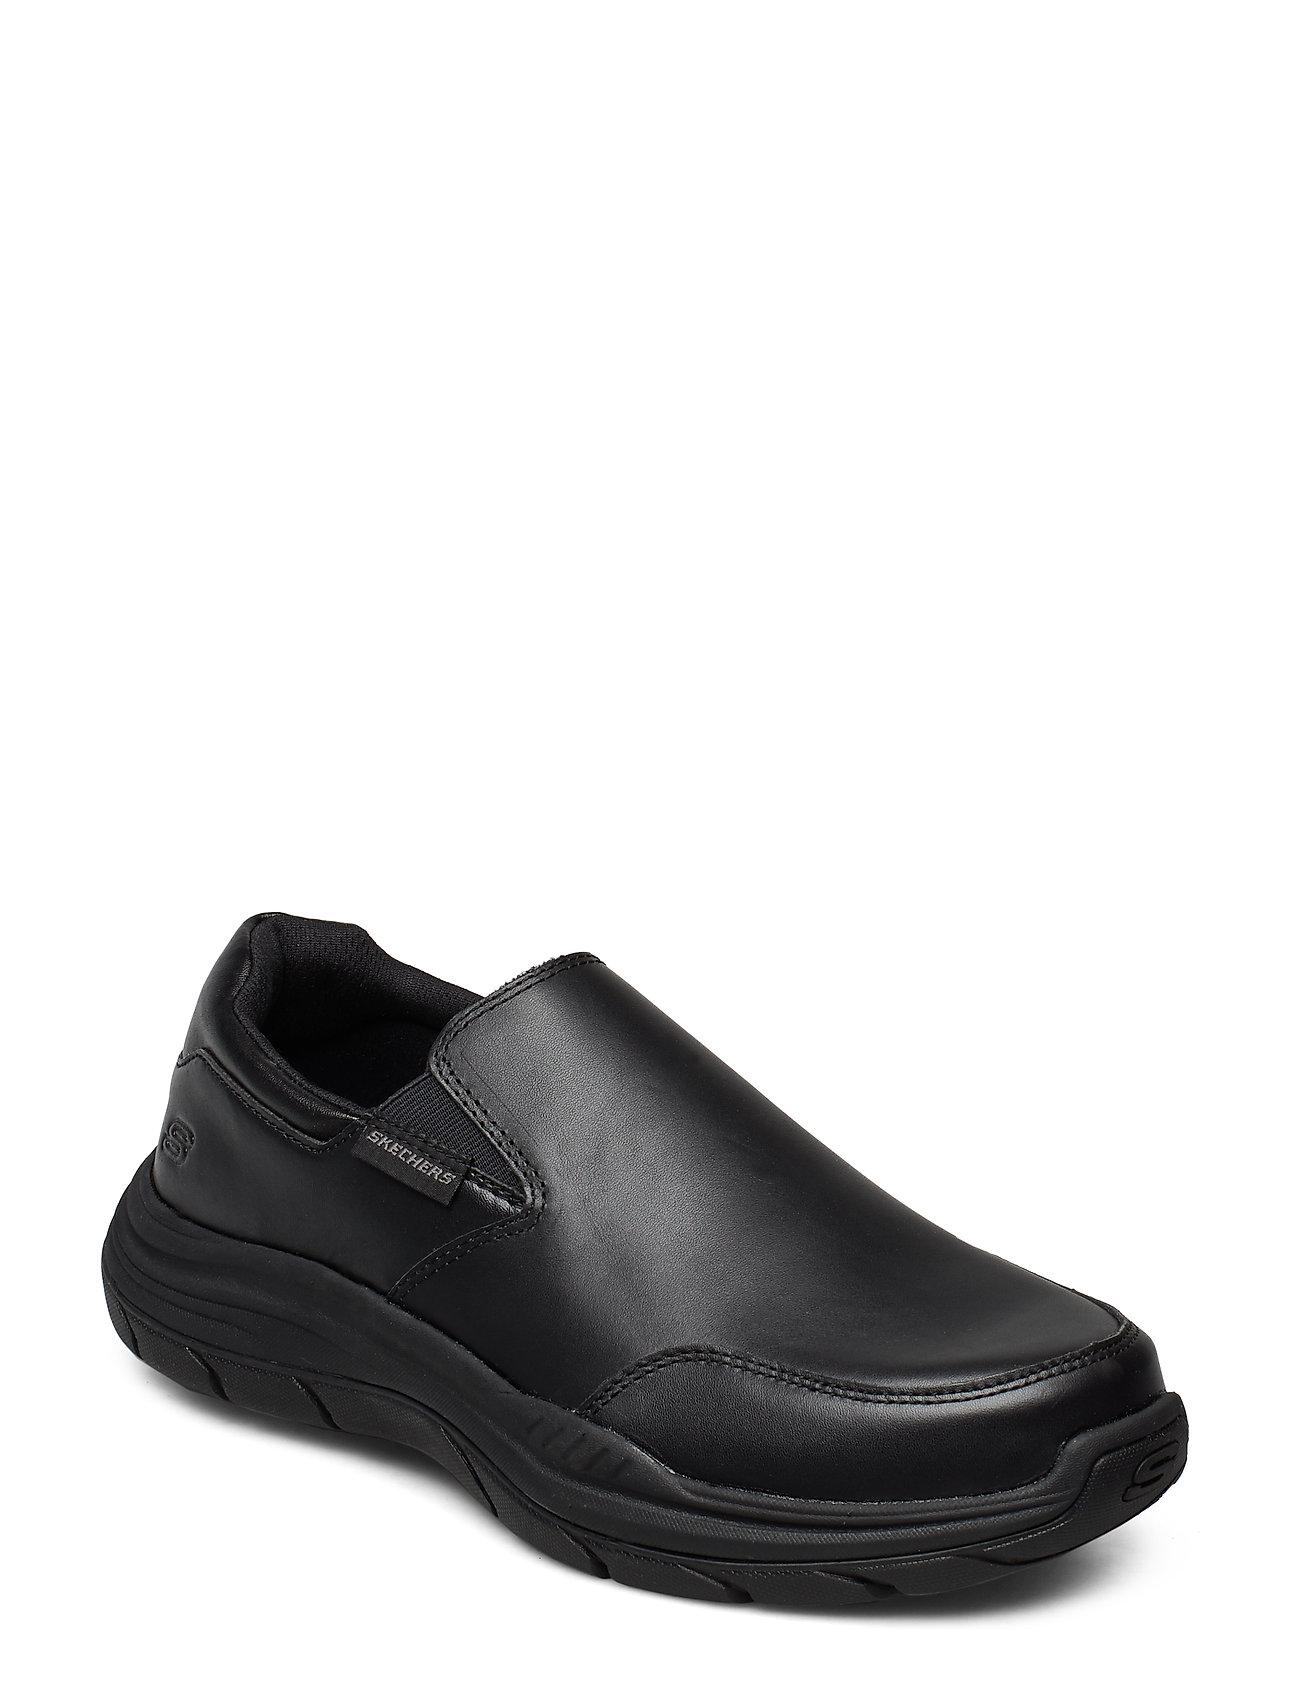 Skechers Mens Expected 2.0 - BLK BLACK